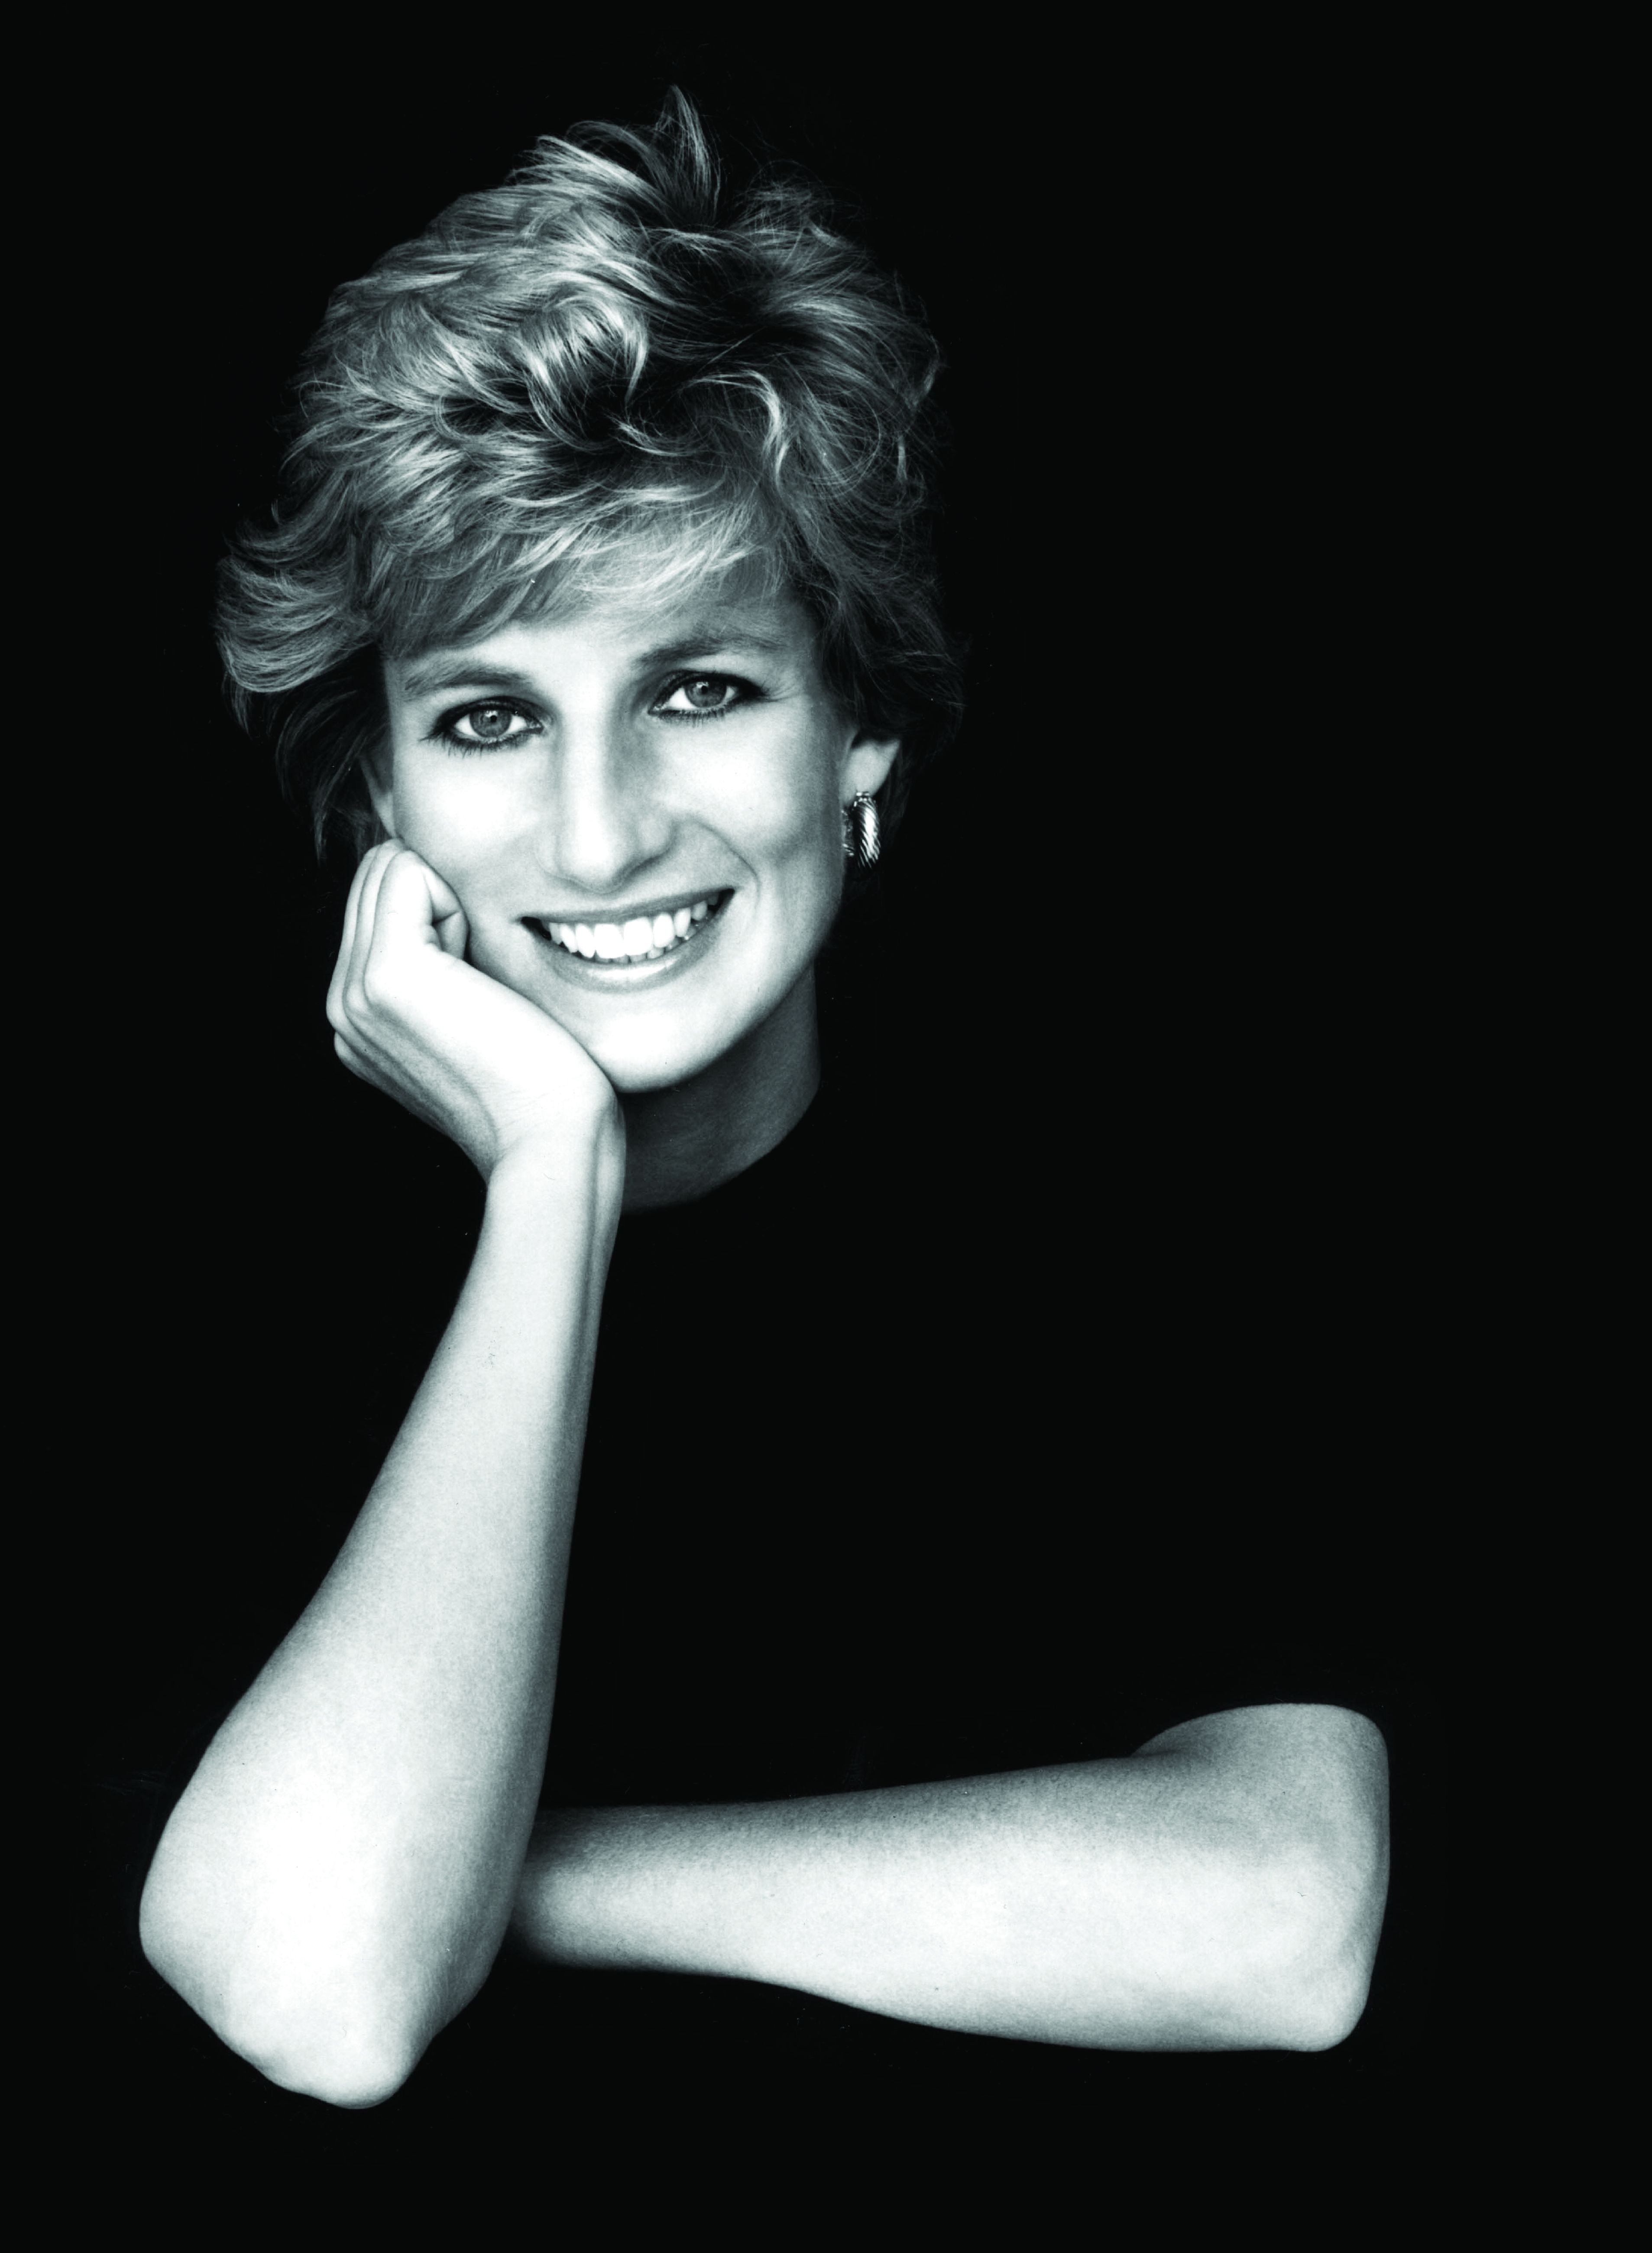 Princess Diana News Blog: Michigan International Women's Show Opens Thursday, May 3